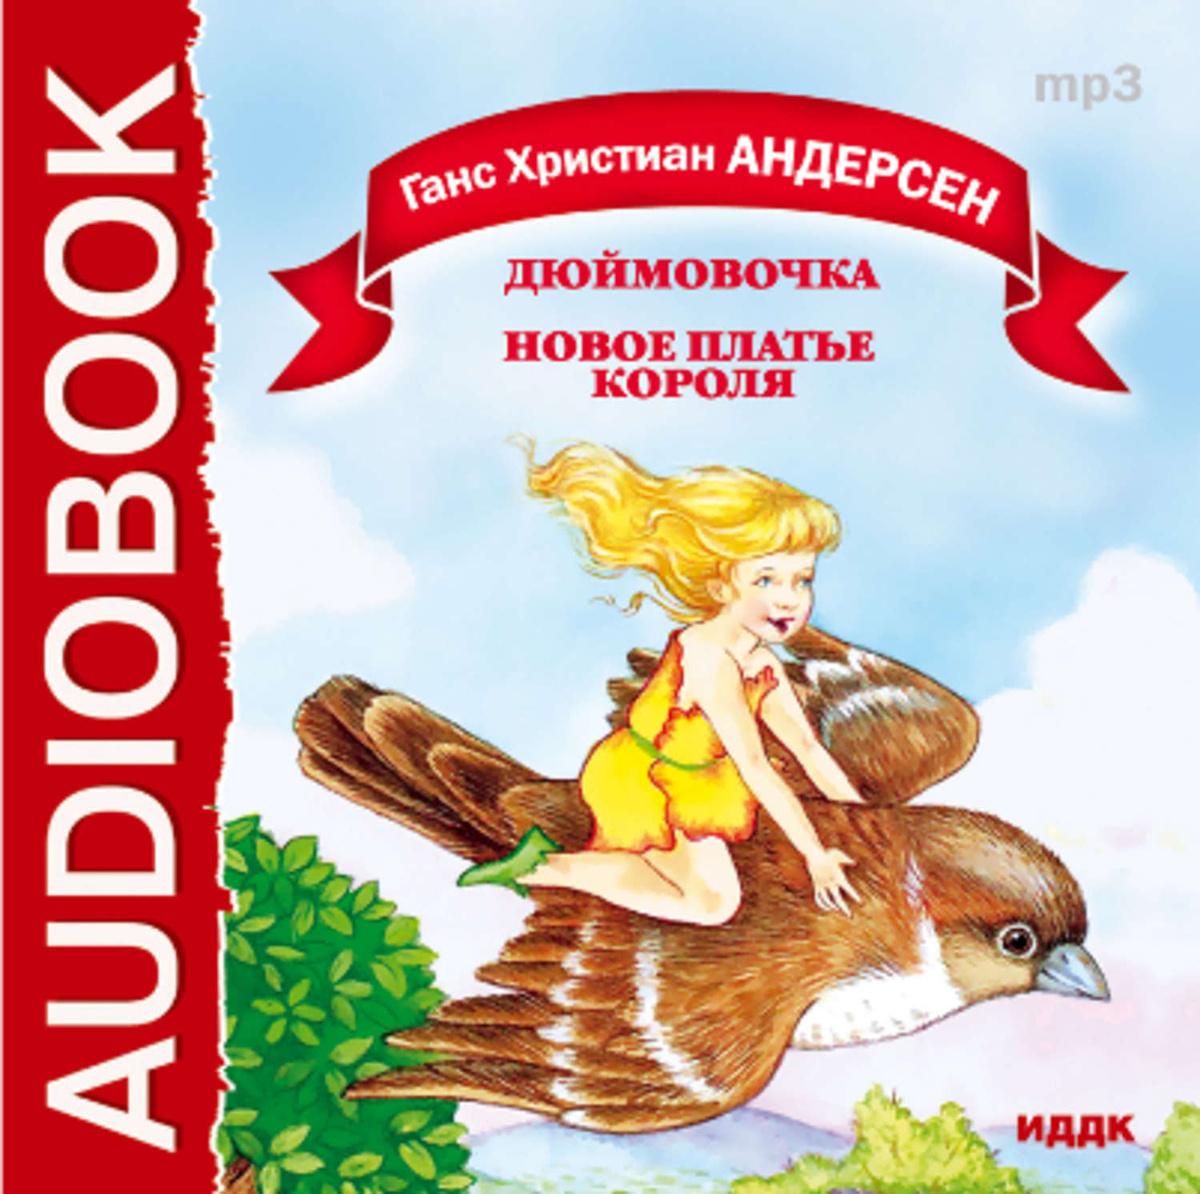 Сказки | Андерсен Ганс Христиан #1